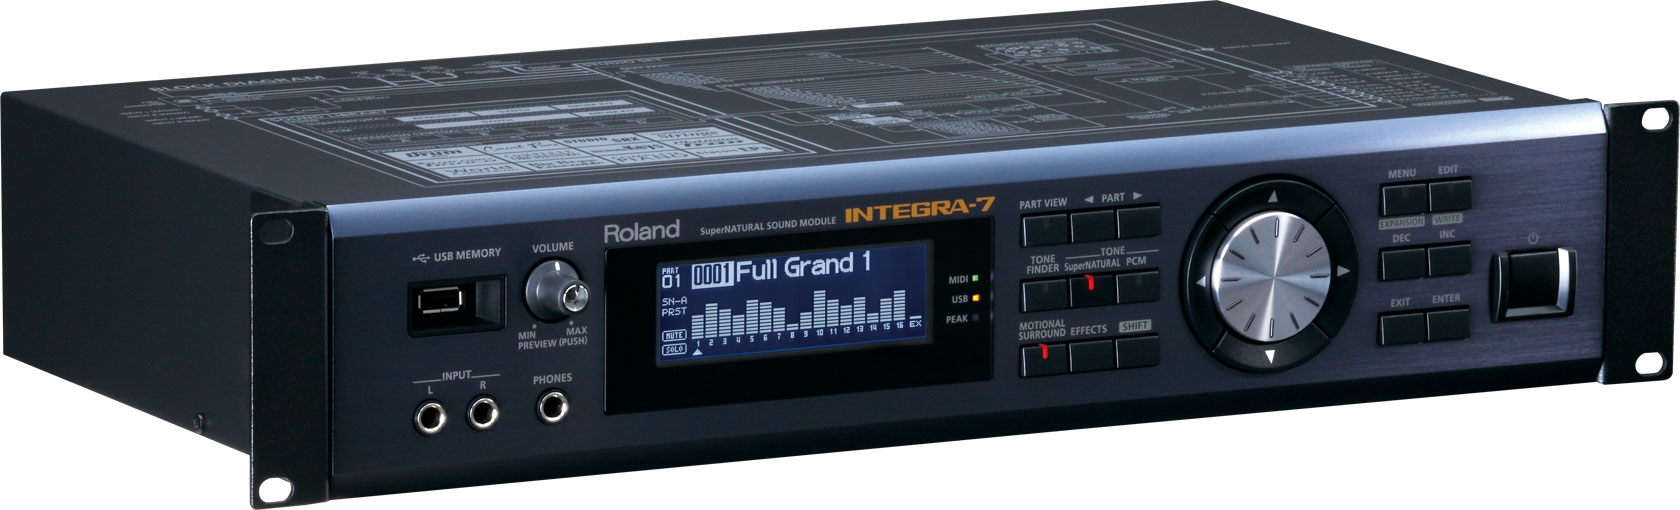 Синтезатор Roland Integra-7: фото